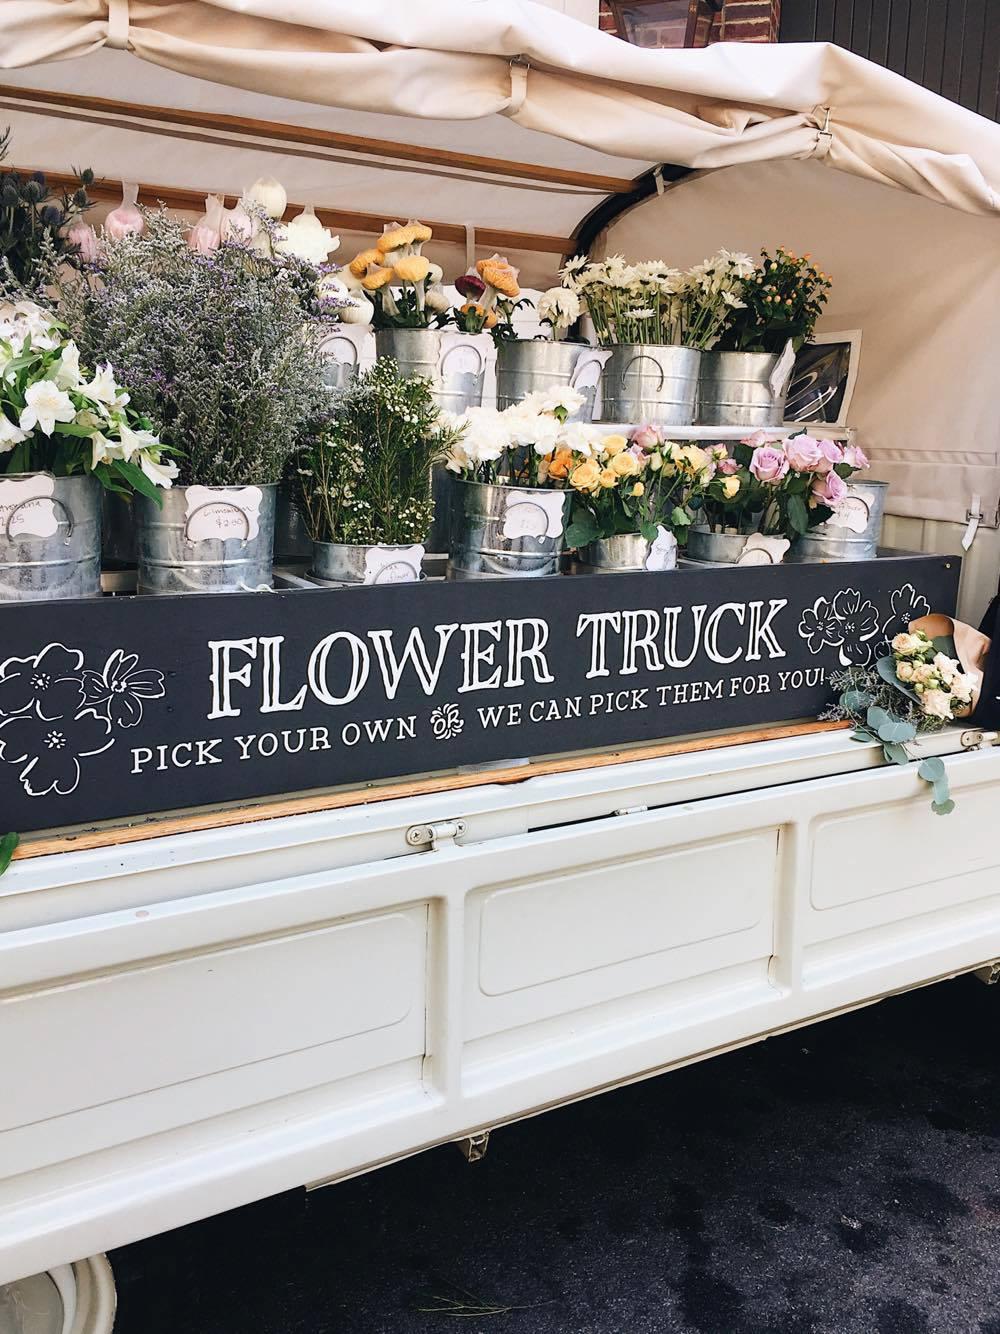 Amelia's Flower Truck!